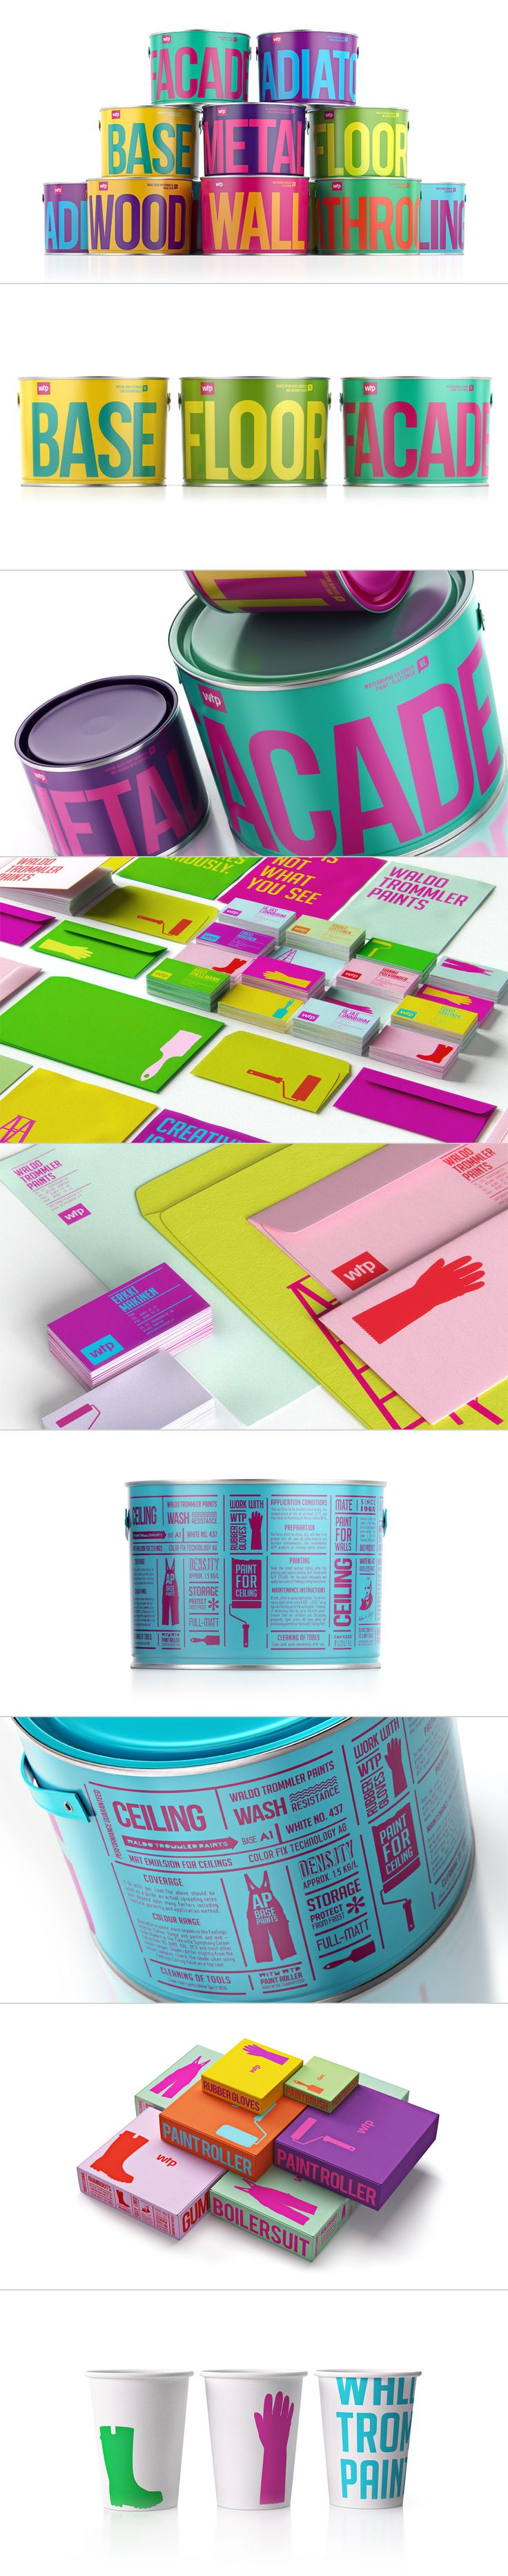 Waldo Trommler Paints, Фирменный стиль © Александр Андреев